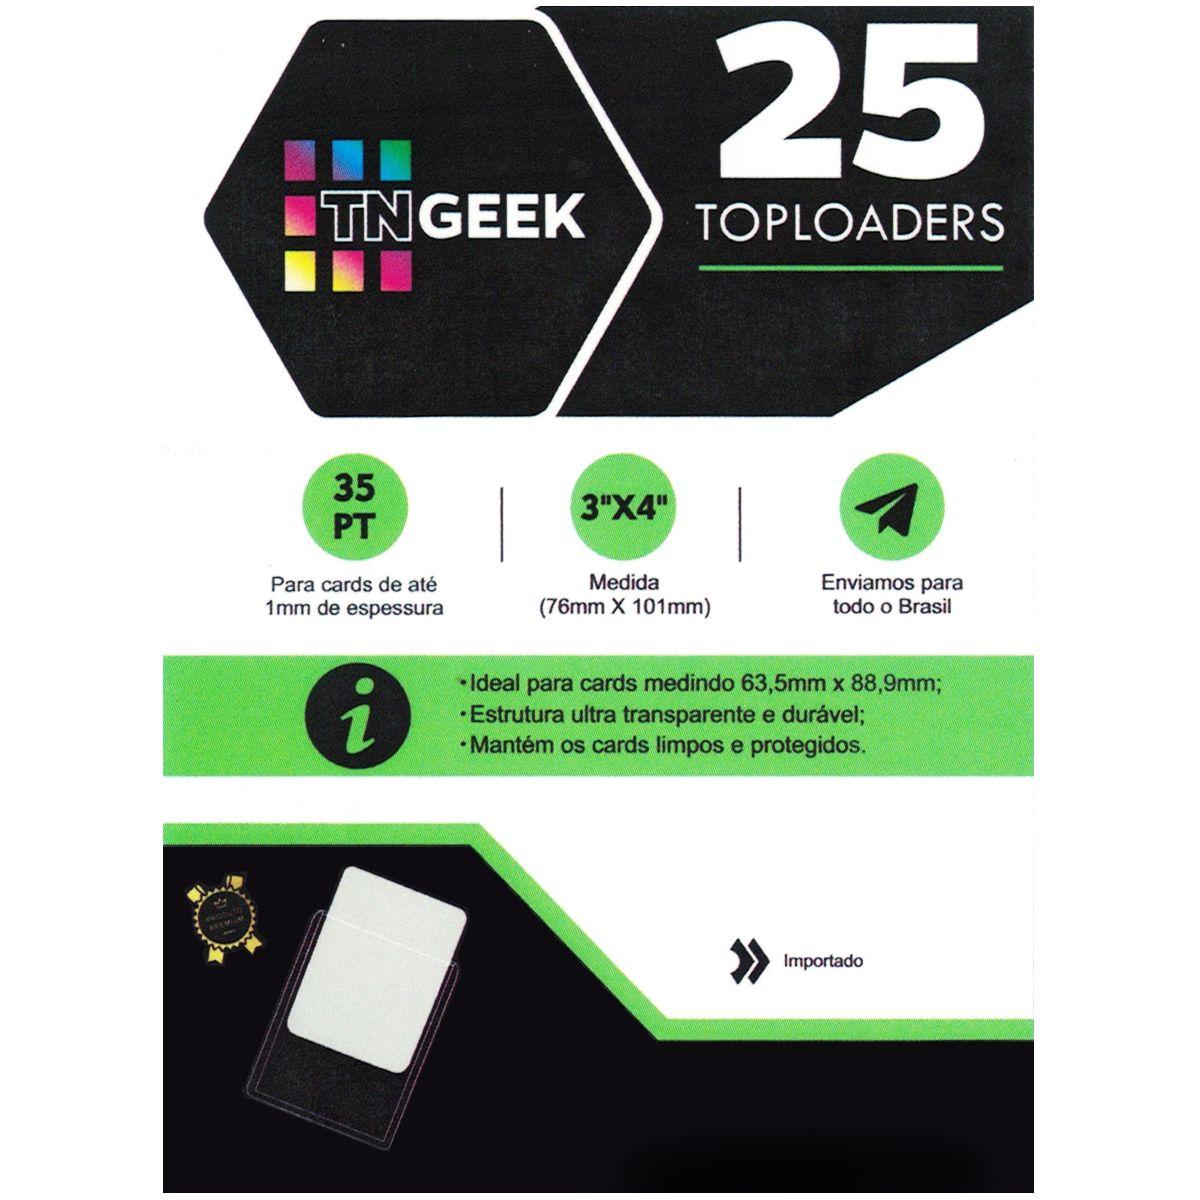 Toploader 3x4 Transparente 25 Unidades TNGeek